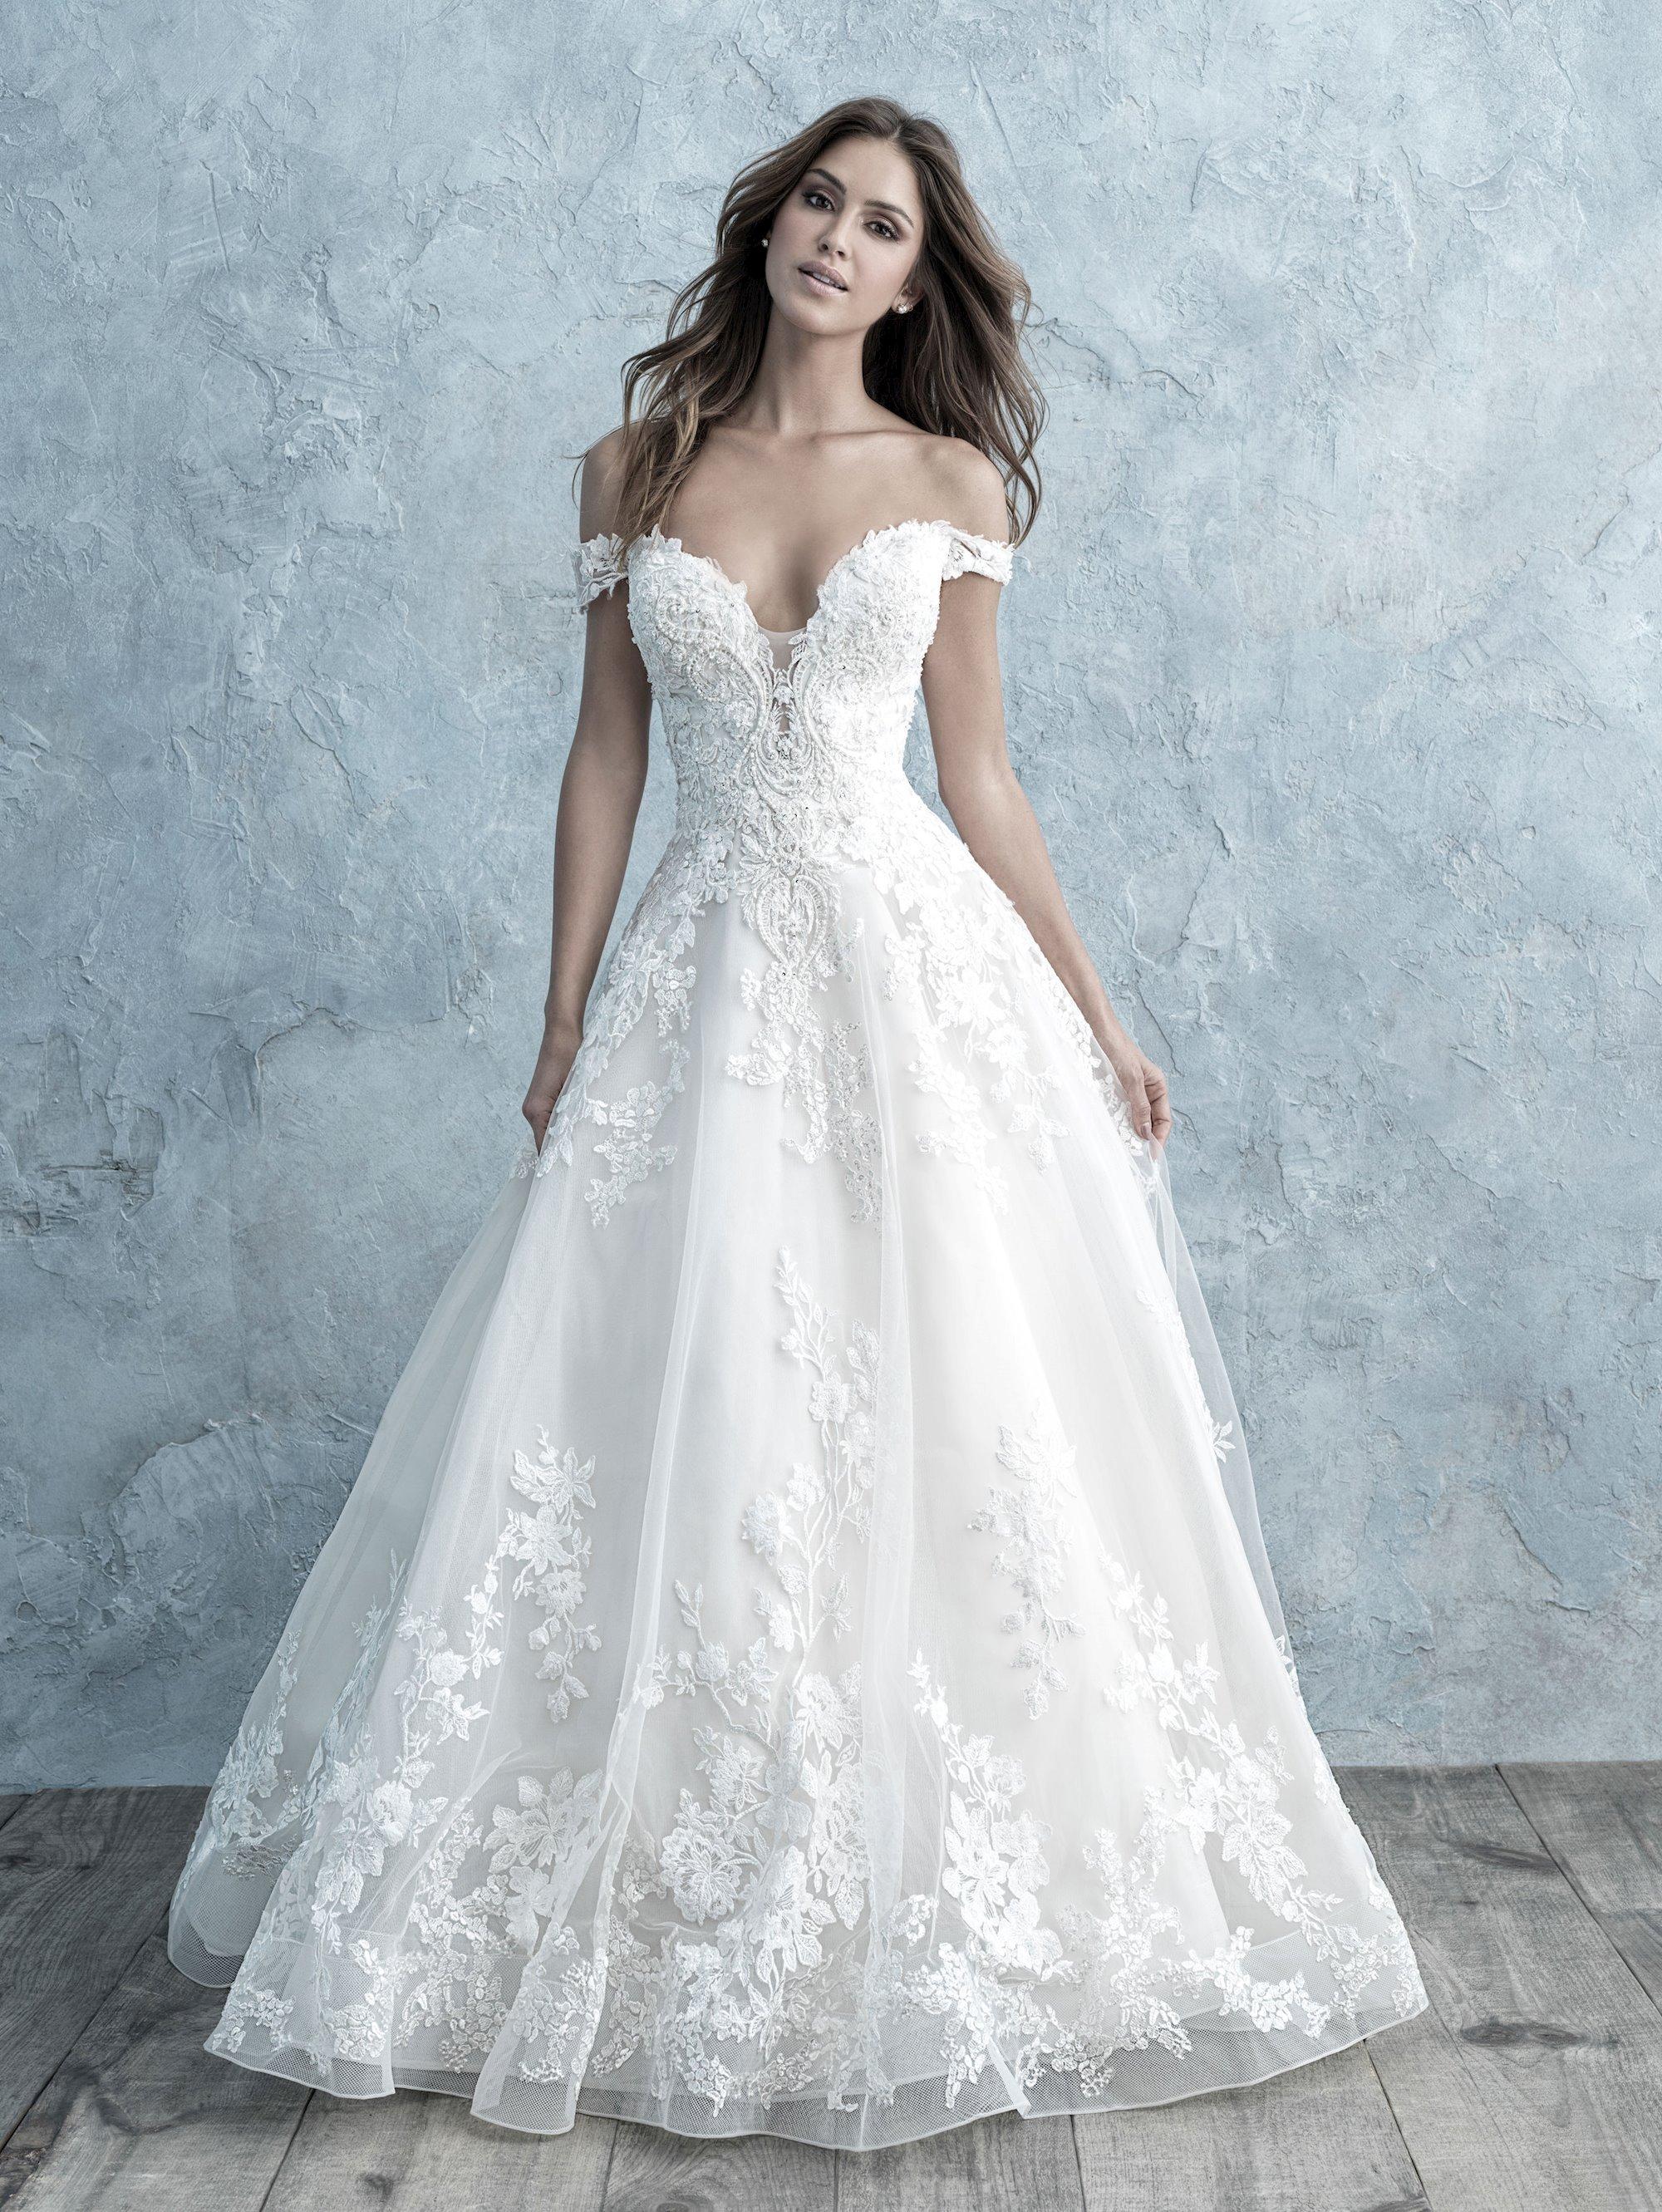 Allure Wedding Dresses.Allure Bridals 9681 Nikki S Glitz And Glam Boutique Bridal Gown